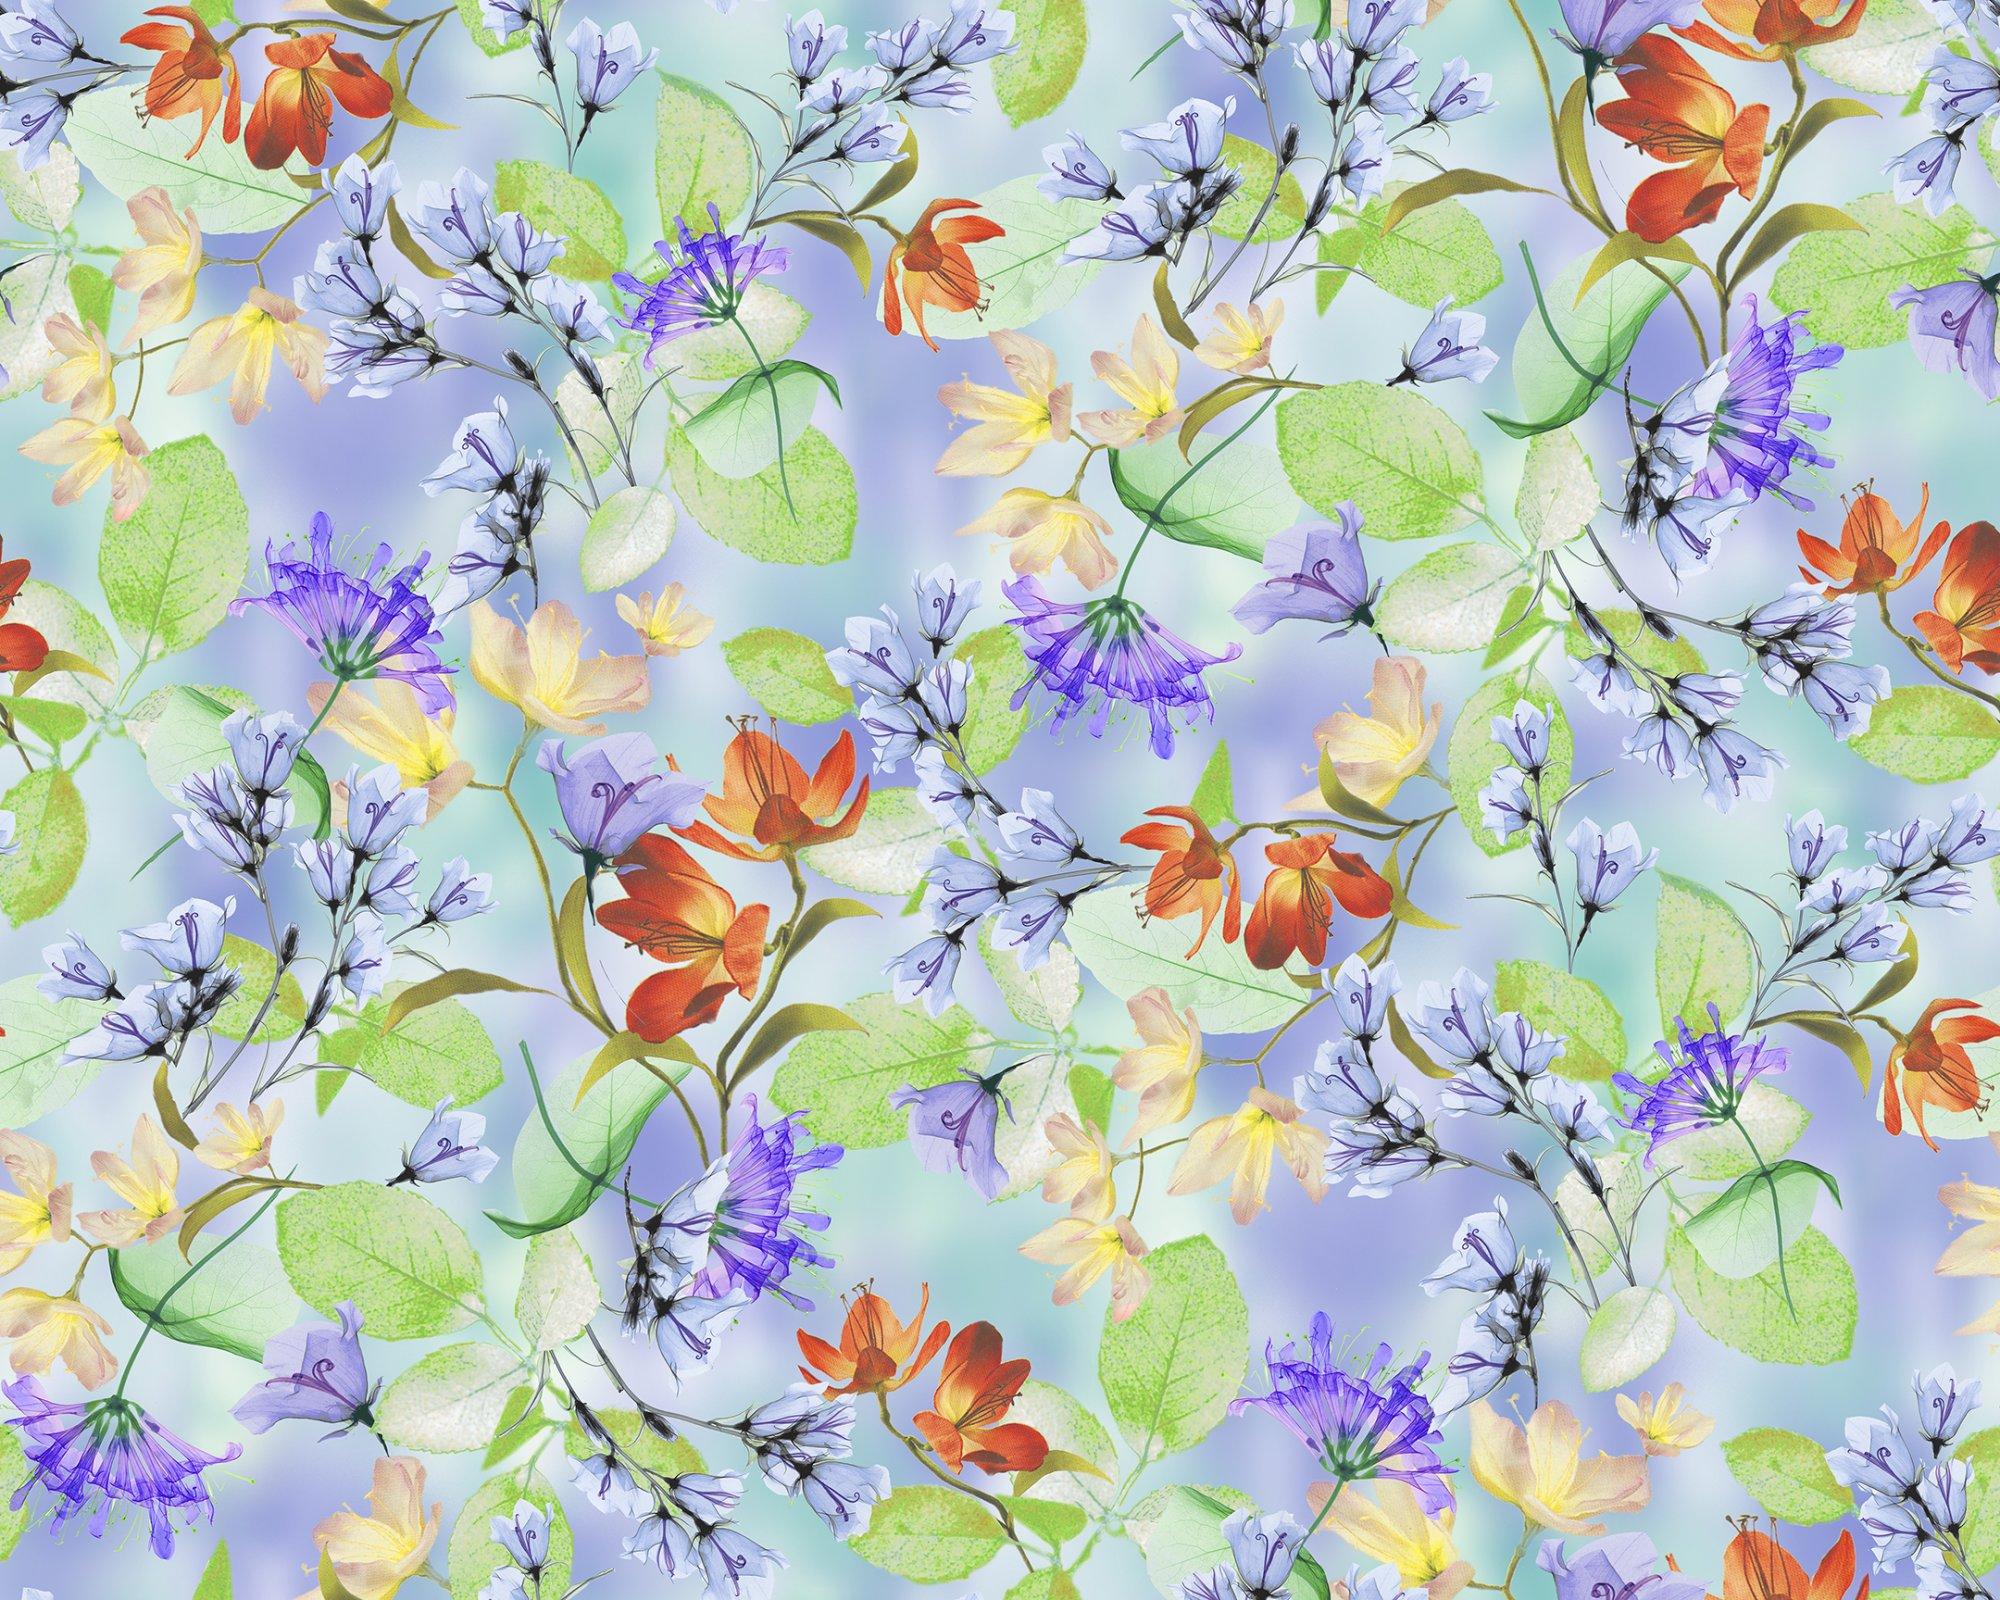 Belle Watercolor Floral 26417-W Periwinkle